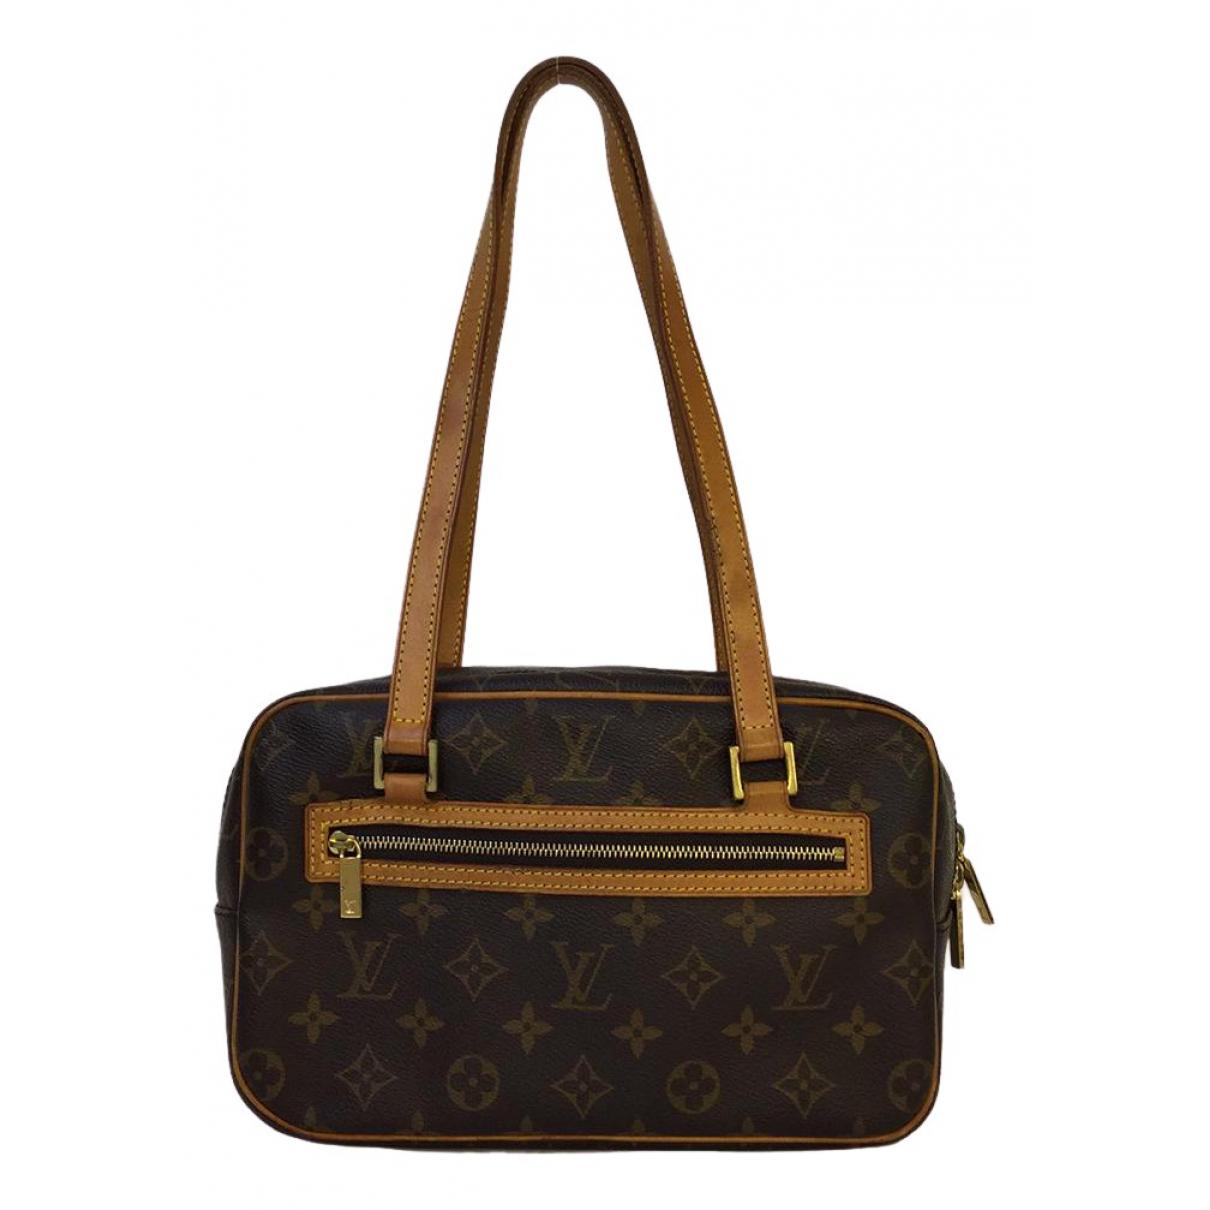 Bandolera Cite  de Lona Louis Vuitton